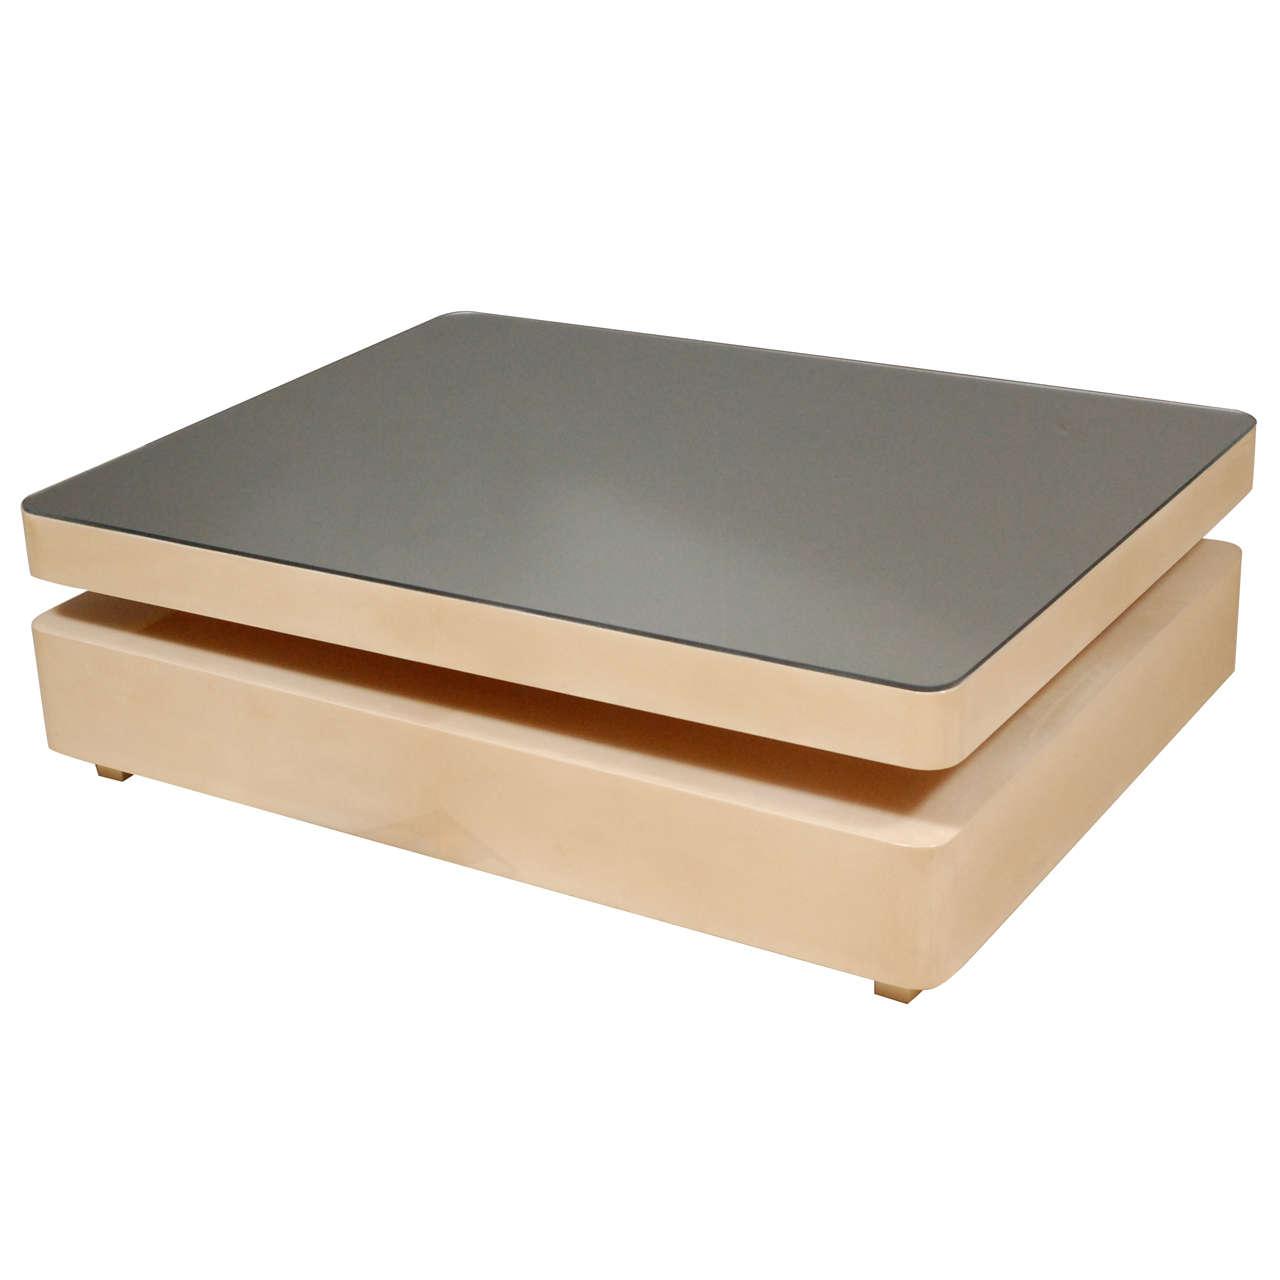 Harvey Probber Marble Top Rectangular Coffee Table W: Rectangular Parchment Coffee Table W/ Sliding Mirrored Top